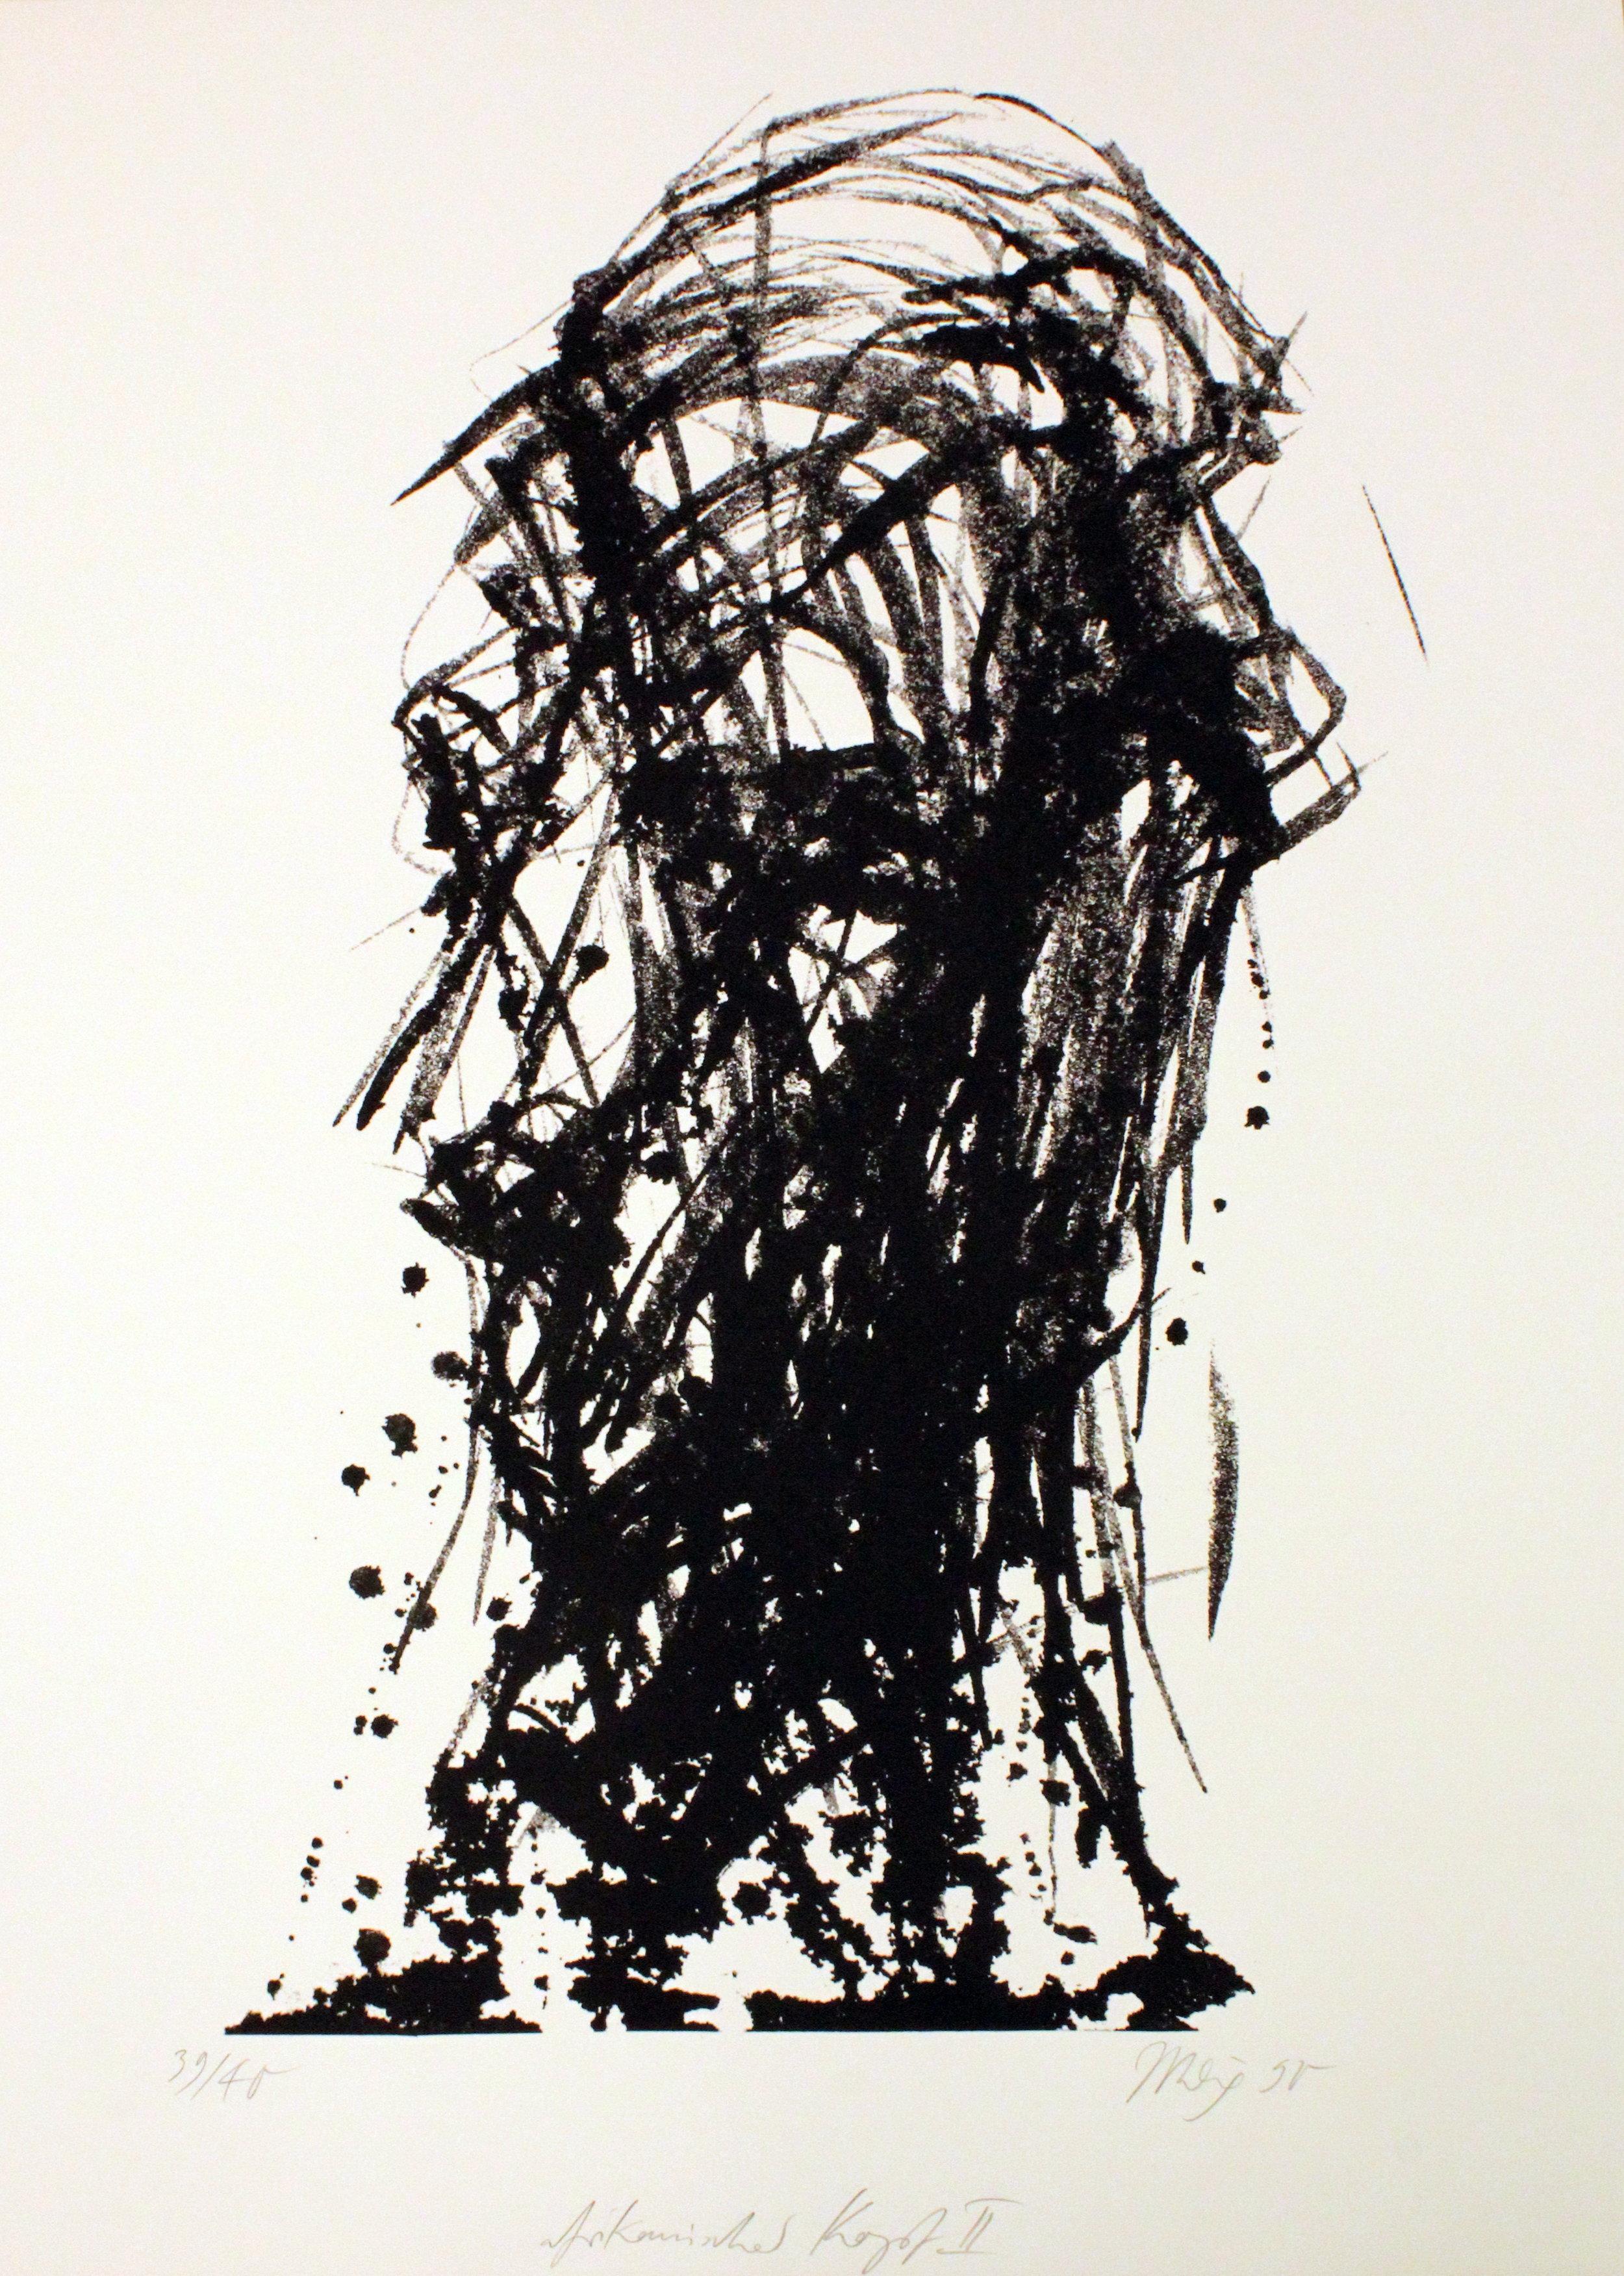 """Afrikanischer Kopf II"" Lithographie, 105,5x74 cm, 1990"